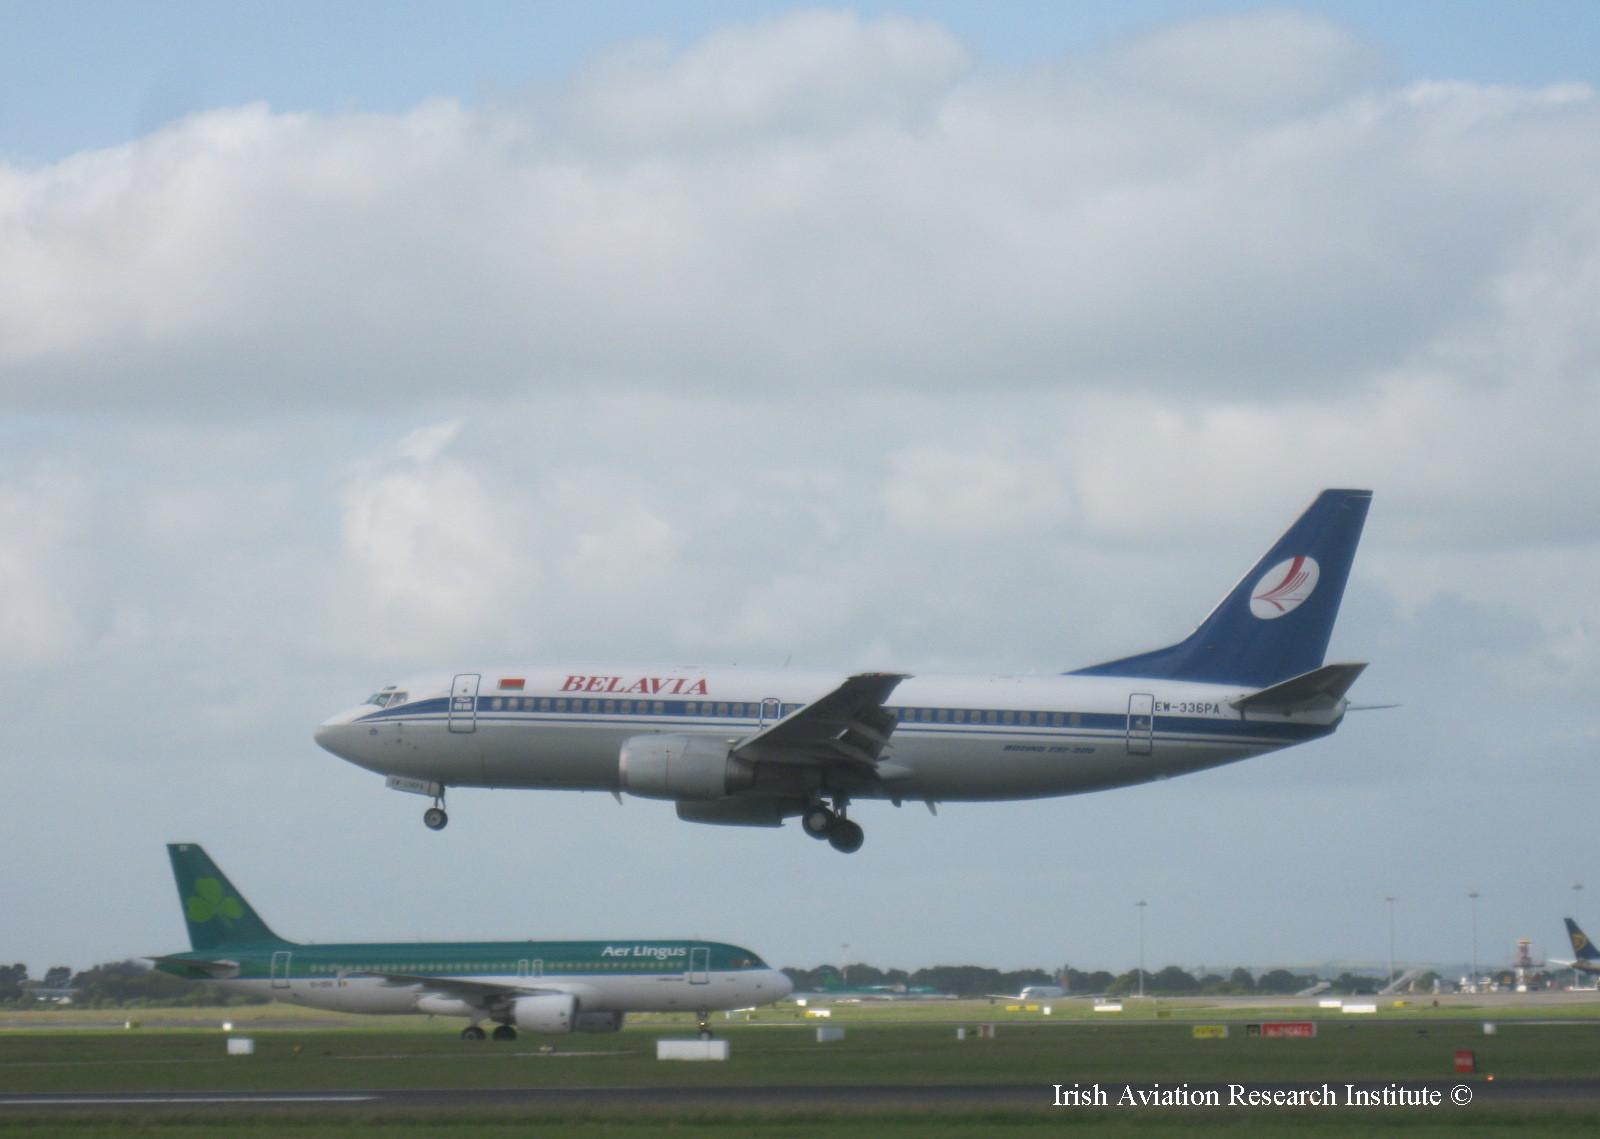 irish airlines: